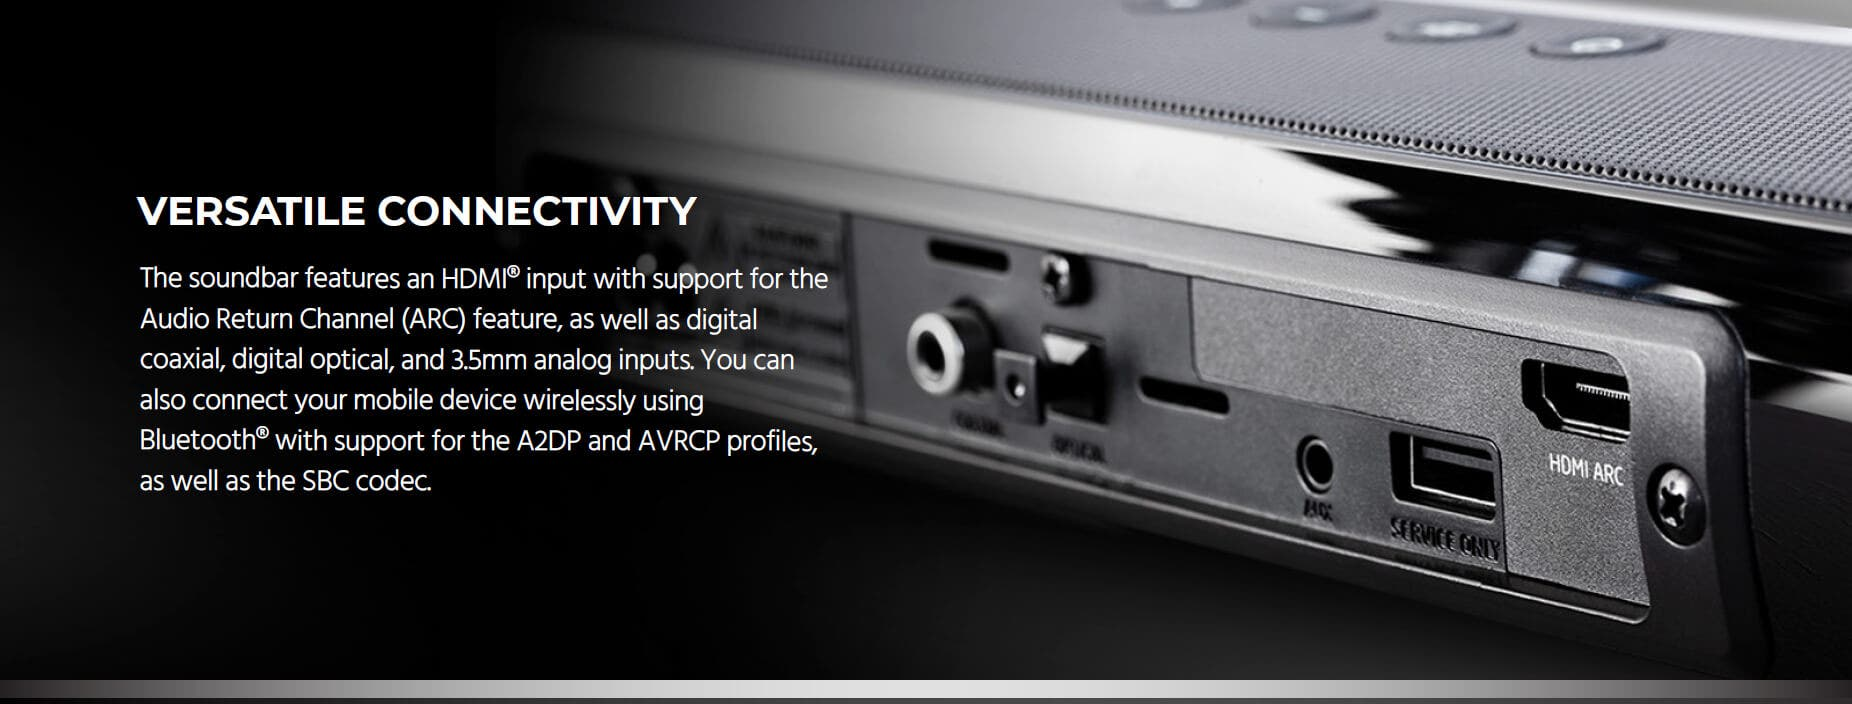 Monoprice SB-200 Premium Slim Soundbar with HDMI ARC